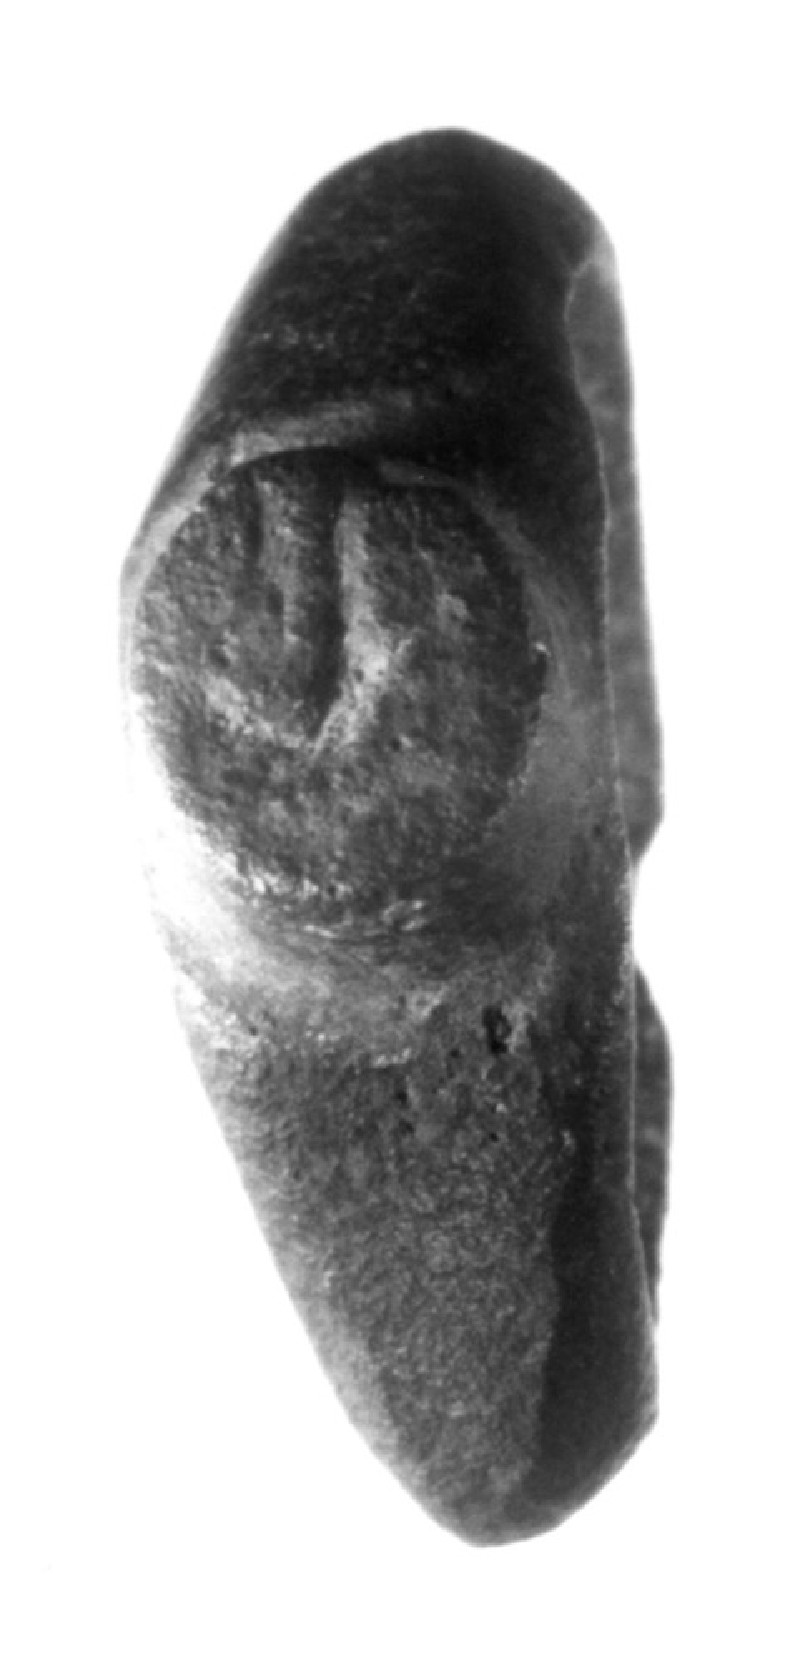 Intaglio gem finger-ring (AN1930.625, record shot)